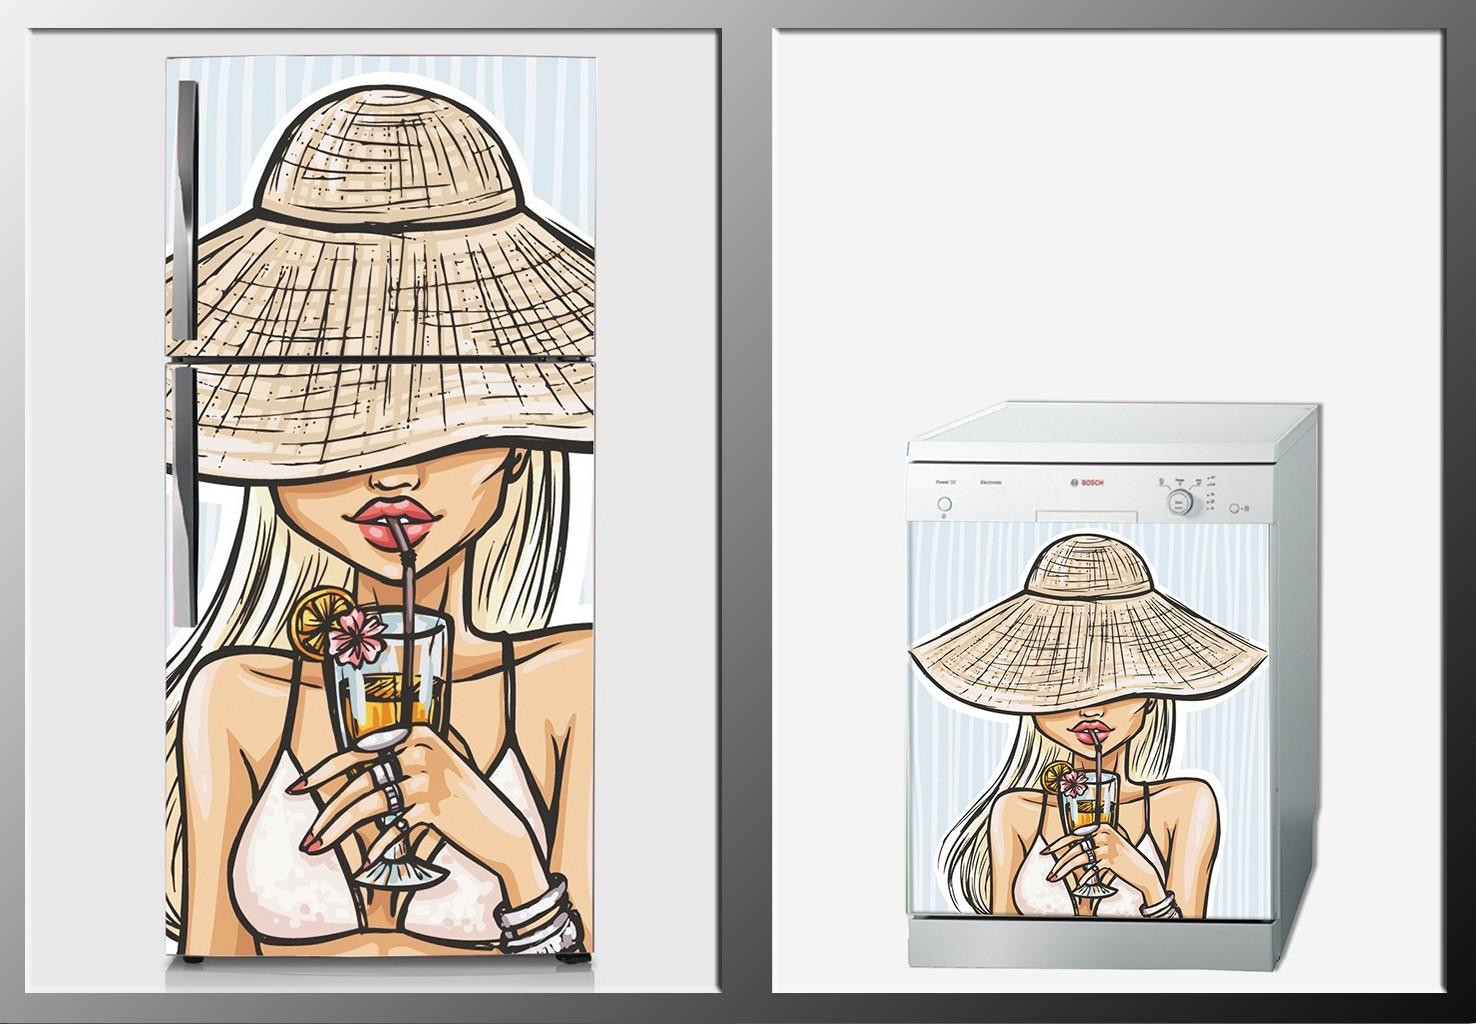 ArtWall Beyaz Eşya İllustrasyon Sticker